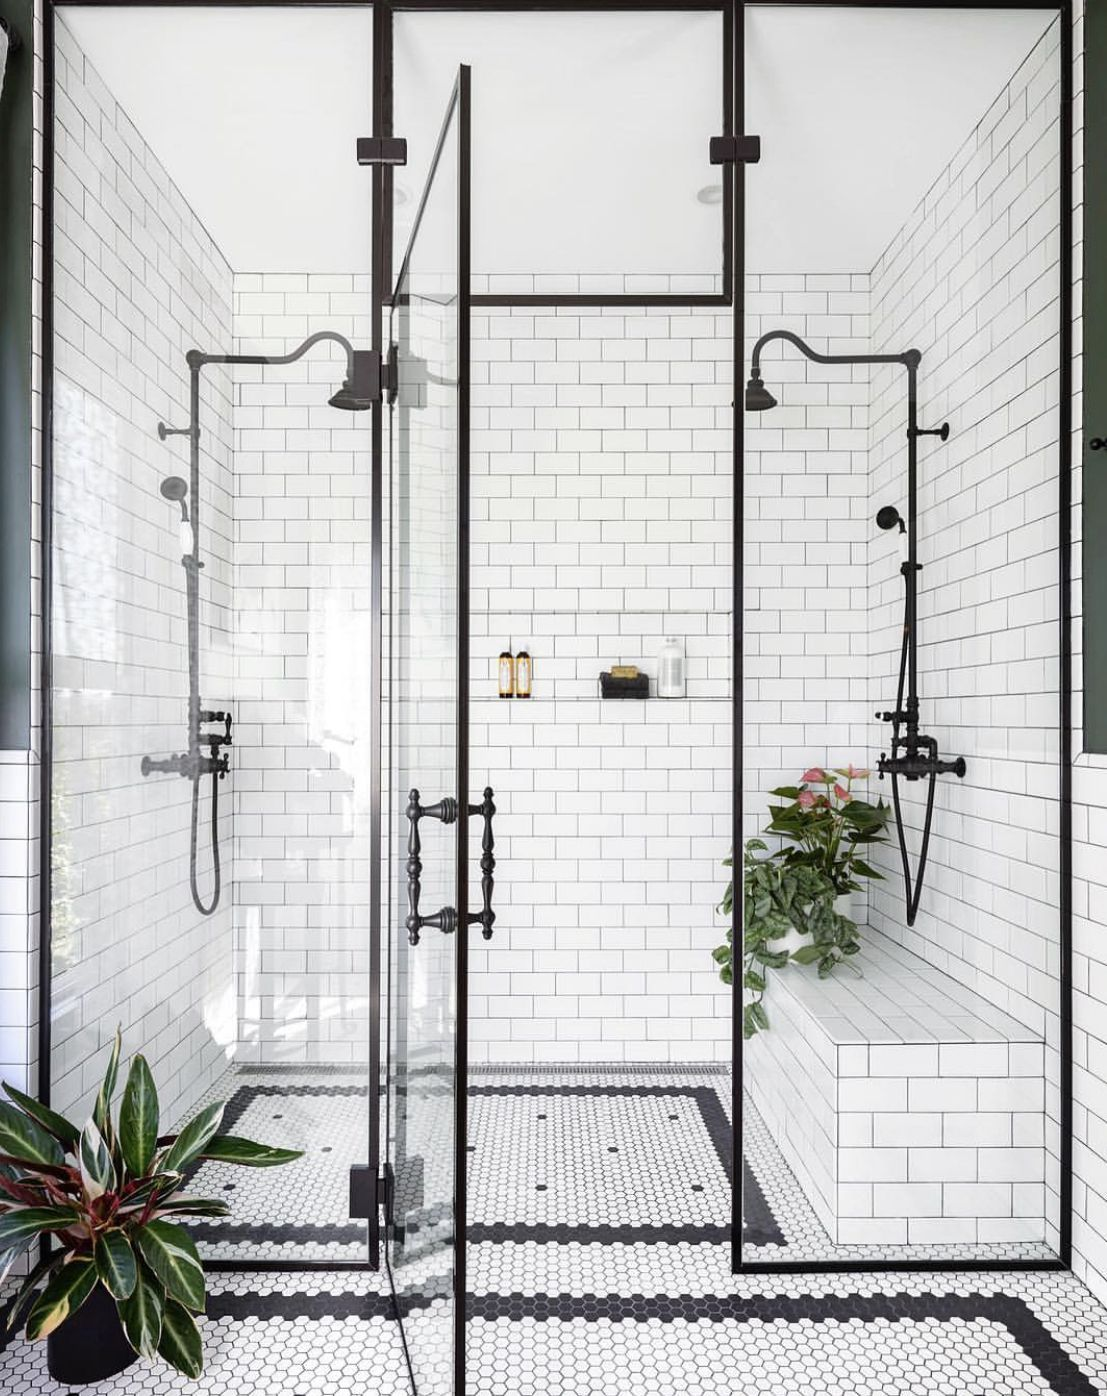 #glassshowerdoors #bathroom #blackandwhitebathroom #industrialdesign